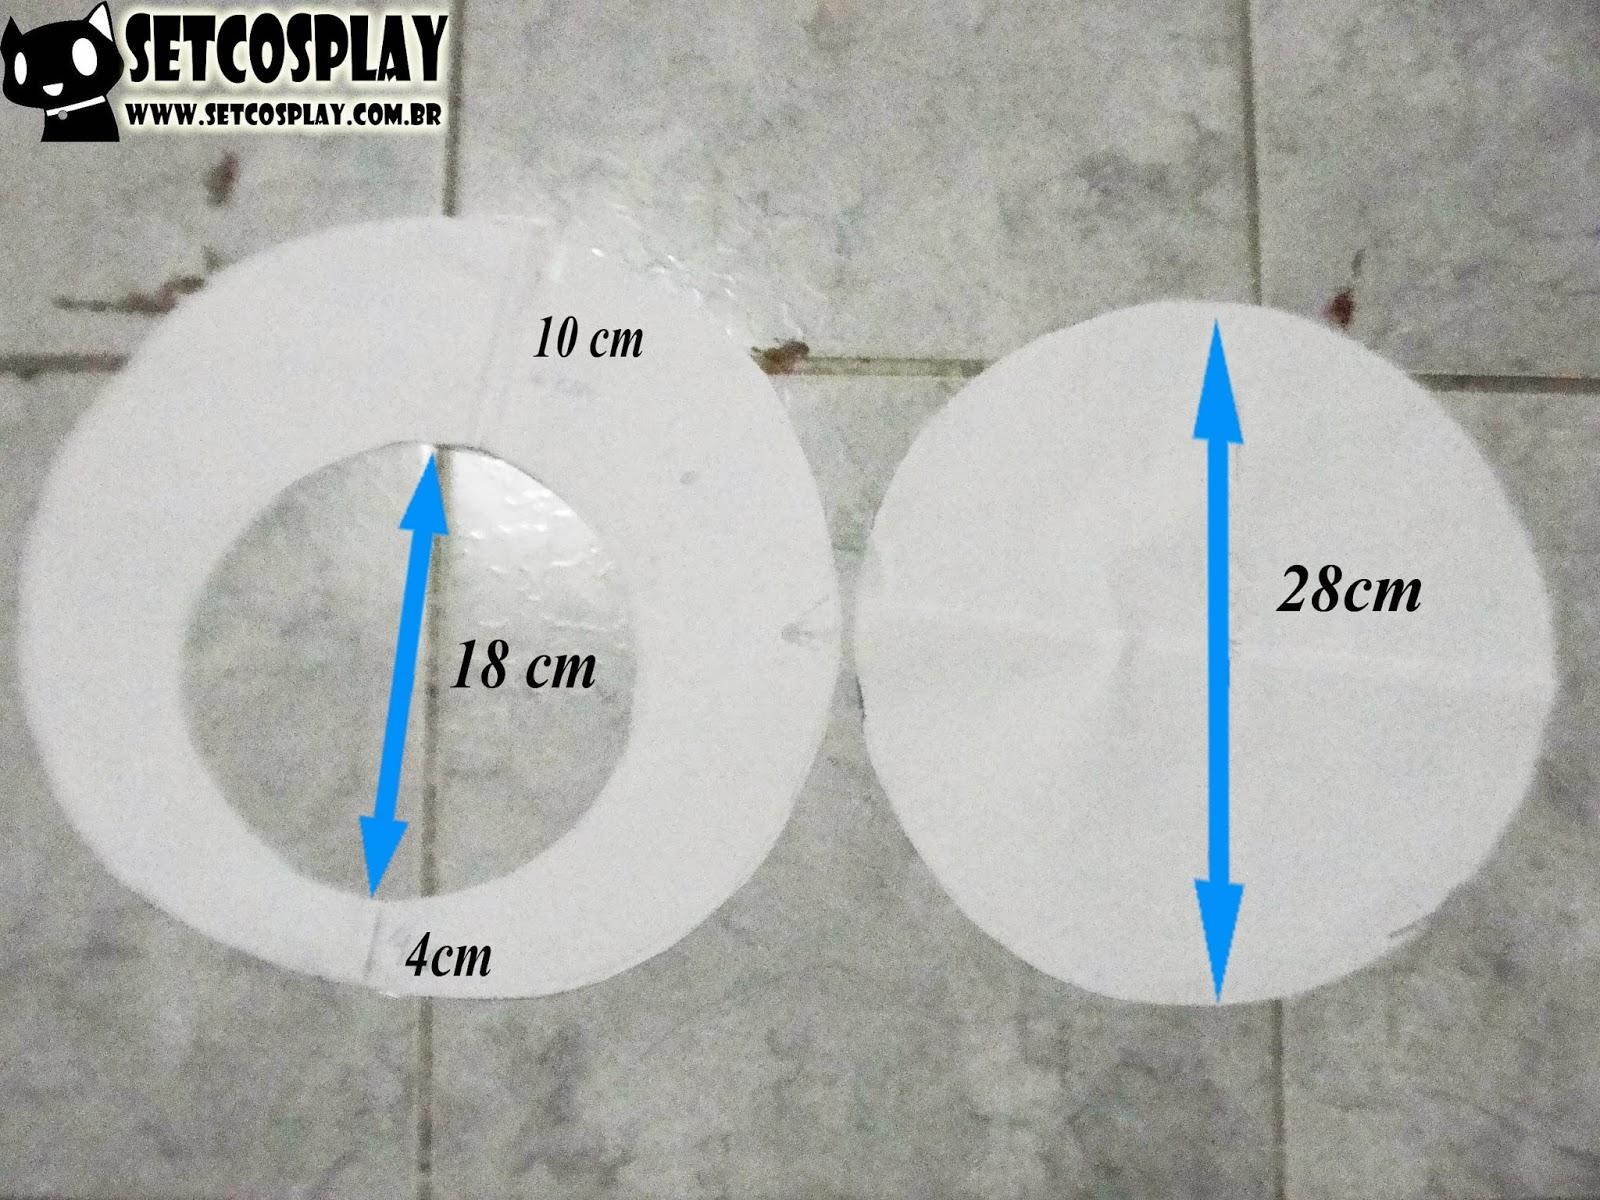 SetCosplay   TUTORIAL  Boina (Cap) do Luigi Mario + Roupa Cosplay f8f554a12bf